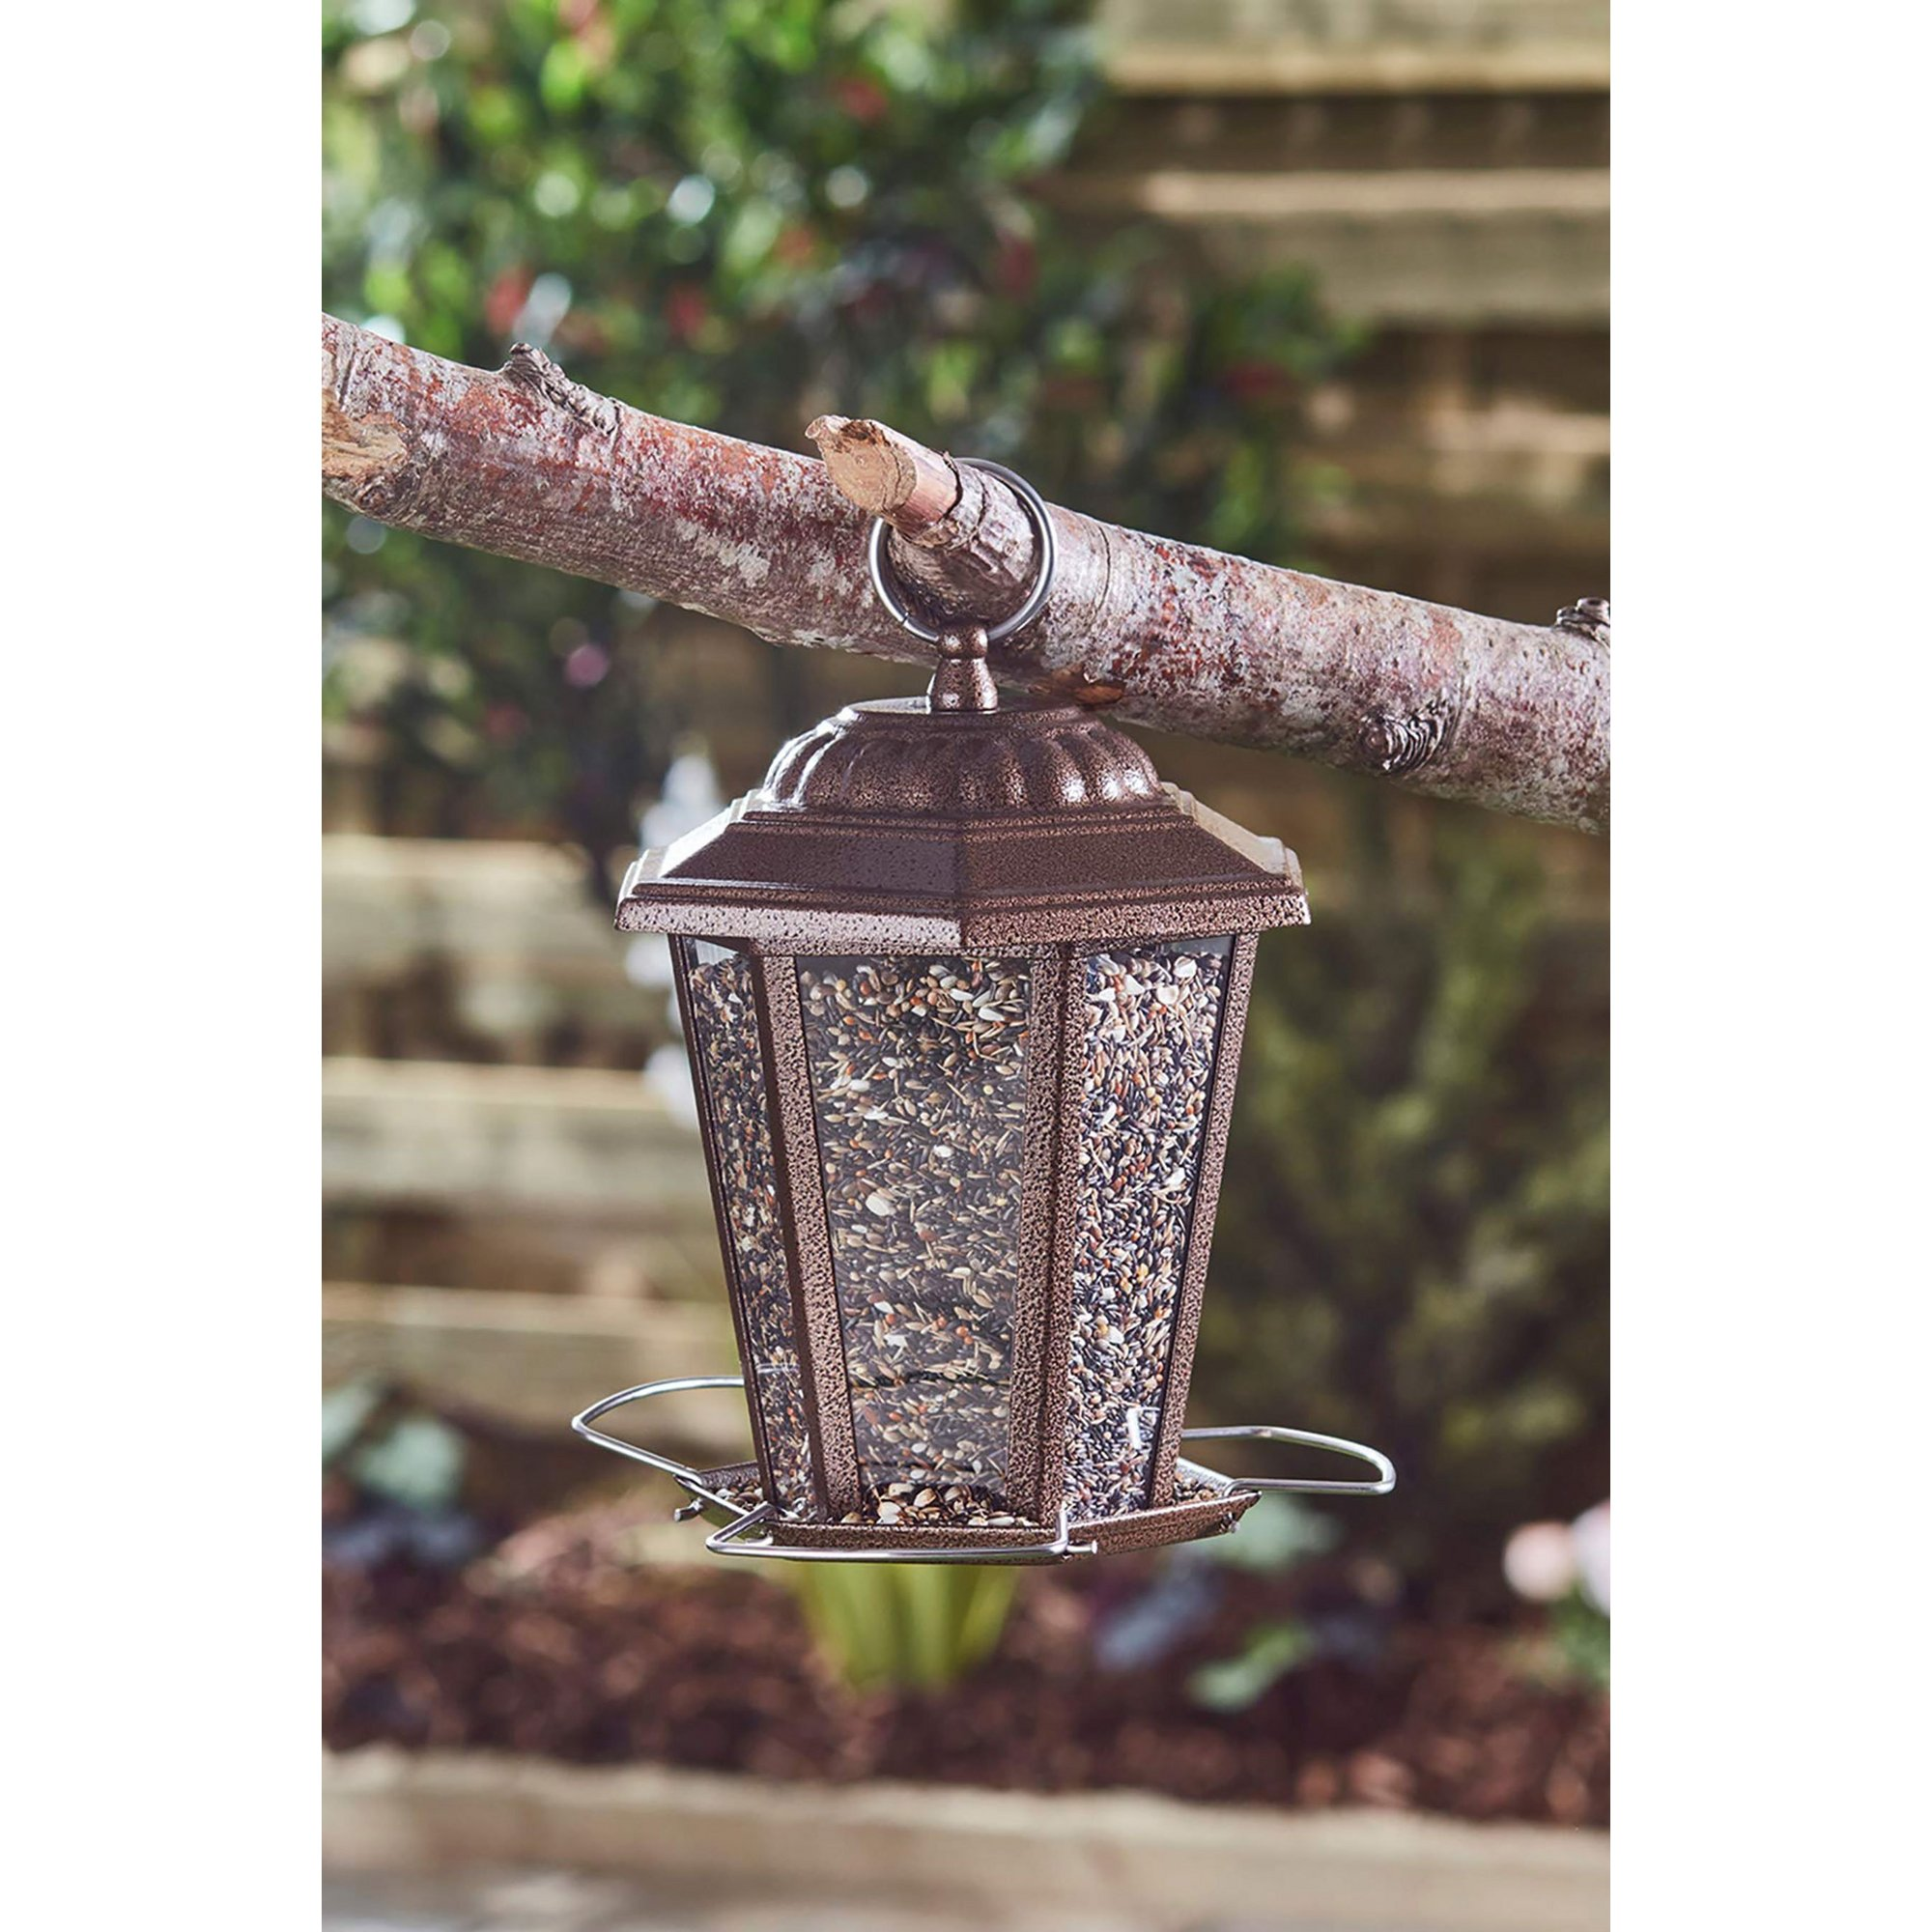 Image of Carriage Style Lantern Feeder